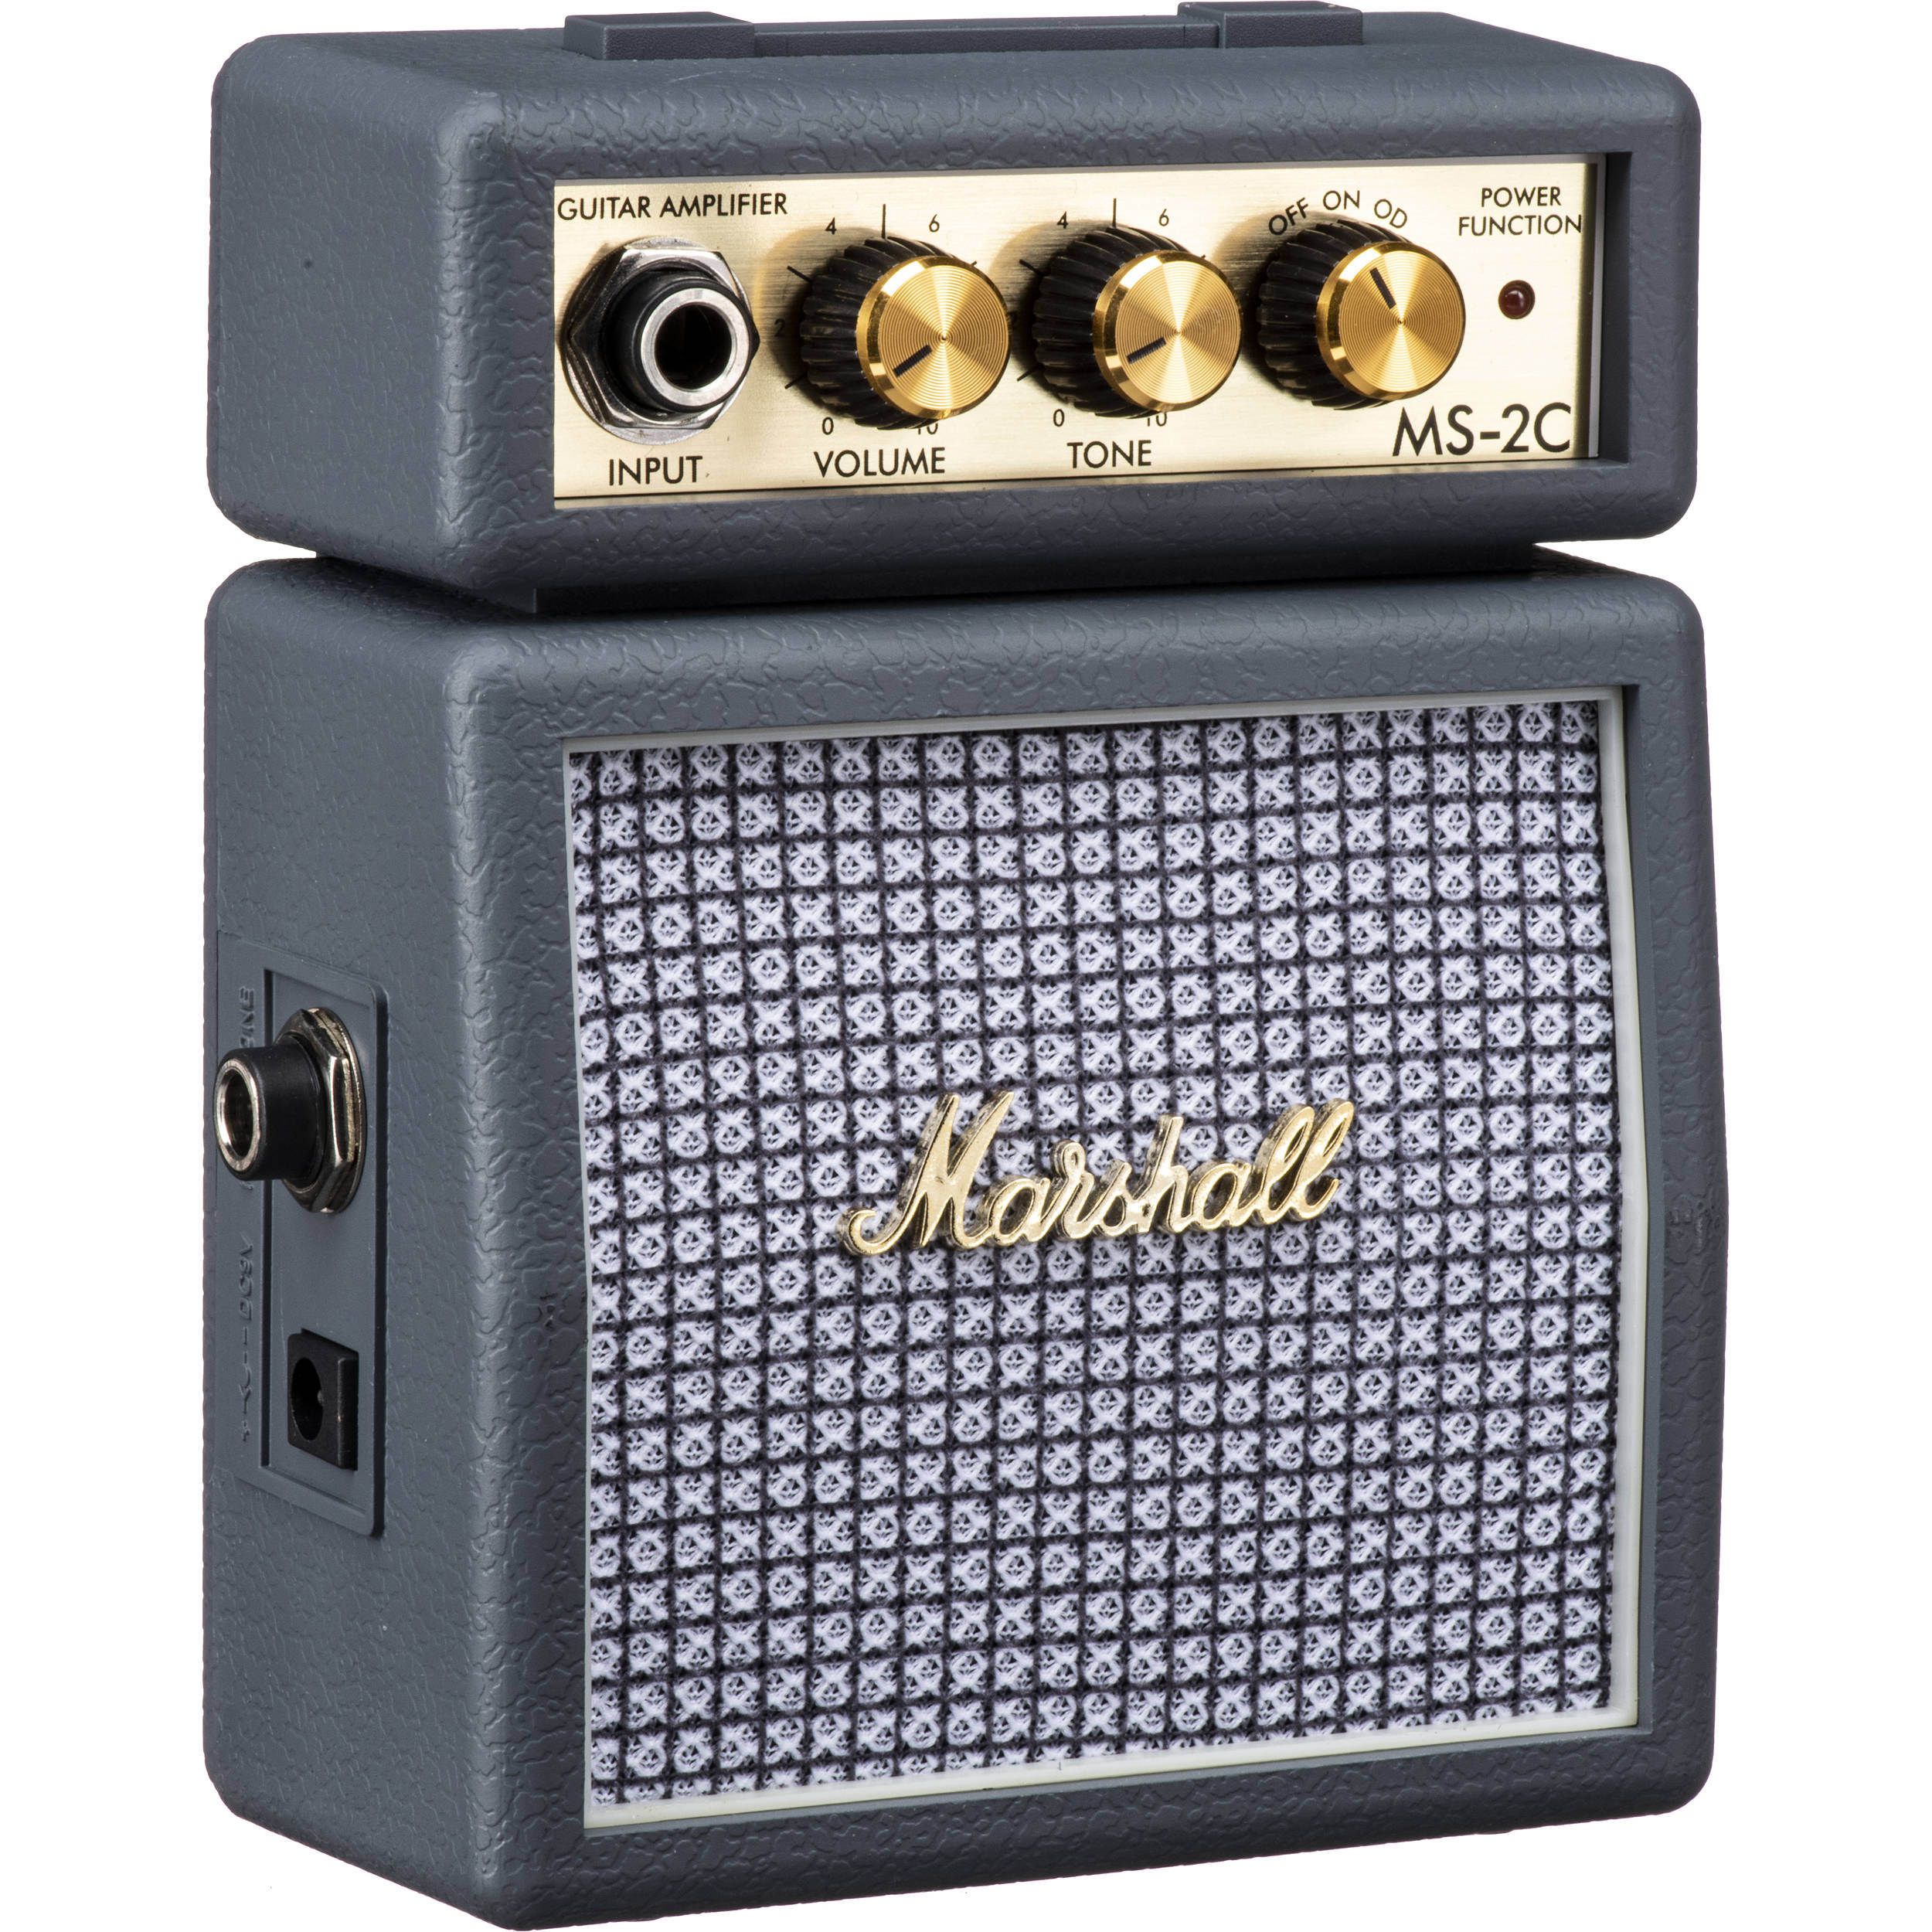 marshall amplification ms 2c micro amp mini practice amp ms 2c. Black Bedroom Furniture Sets. Home Design Ideas